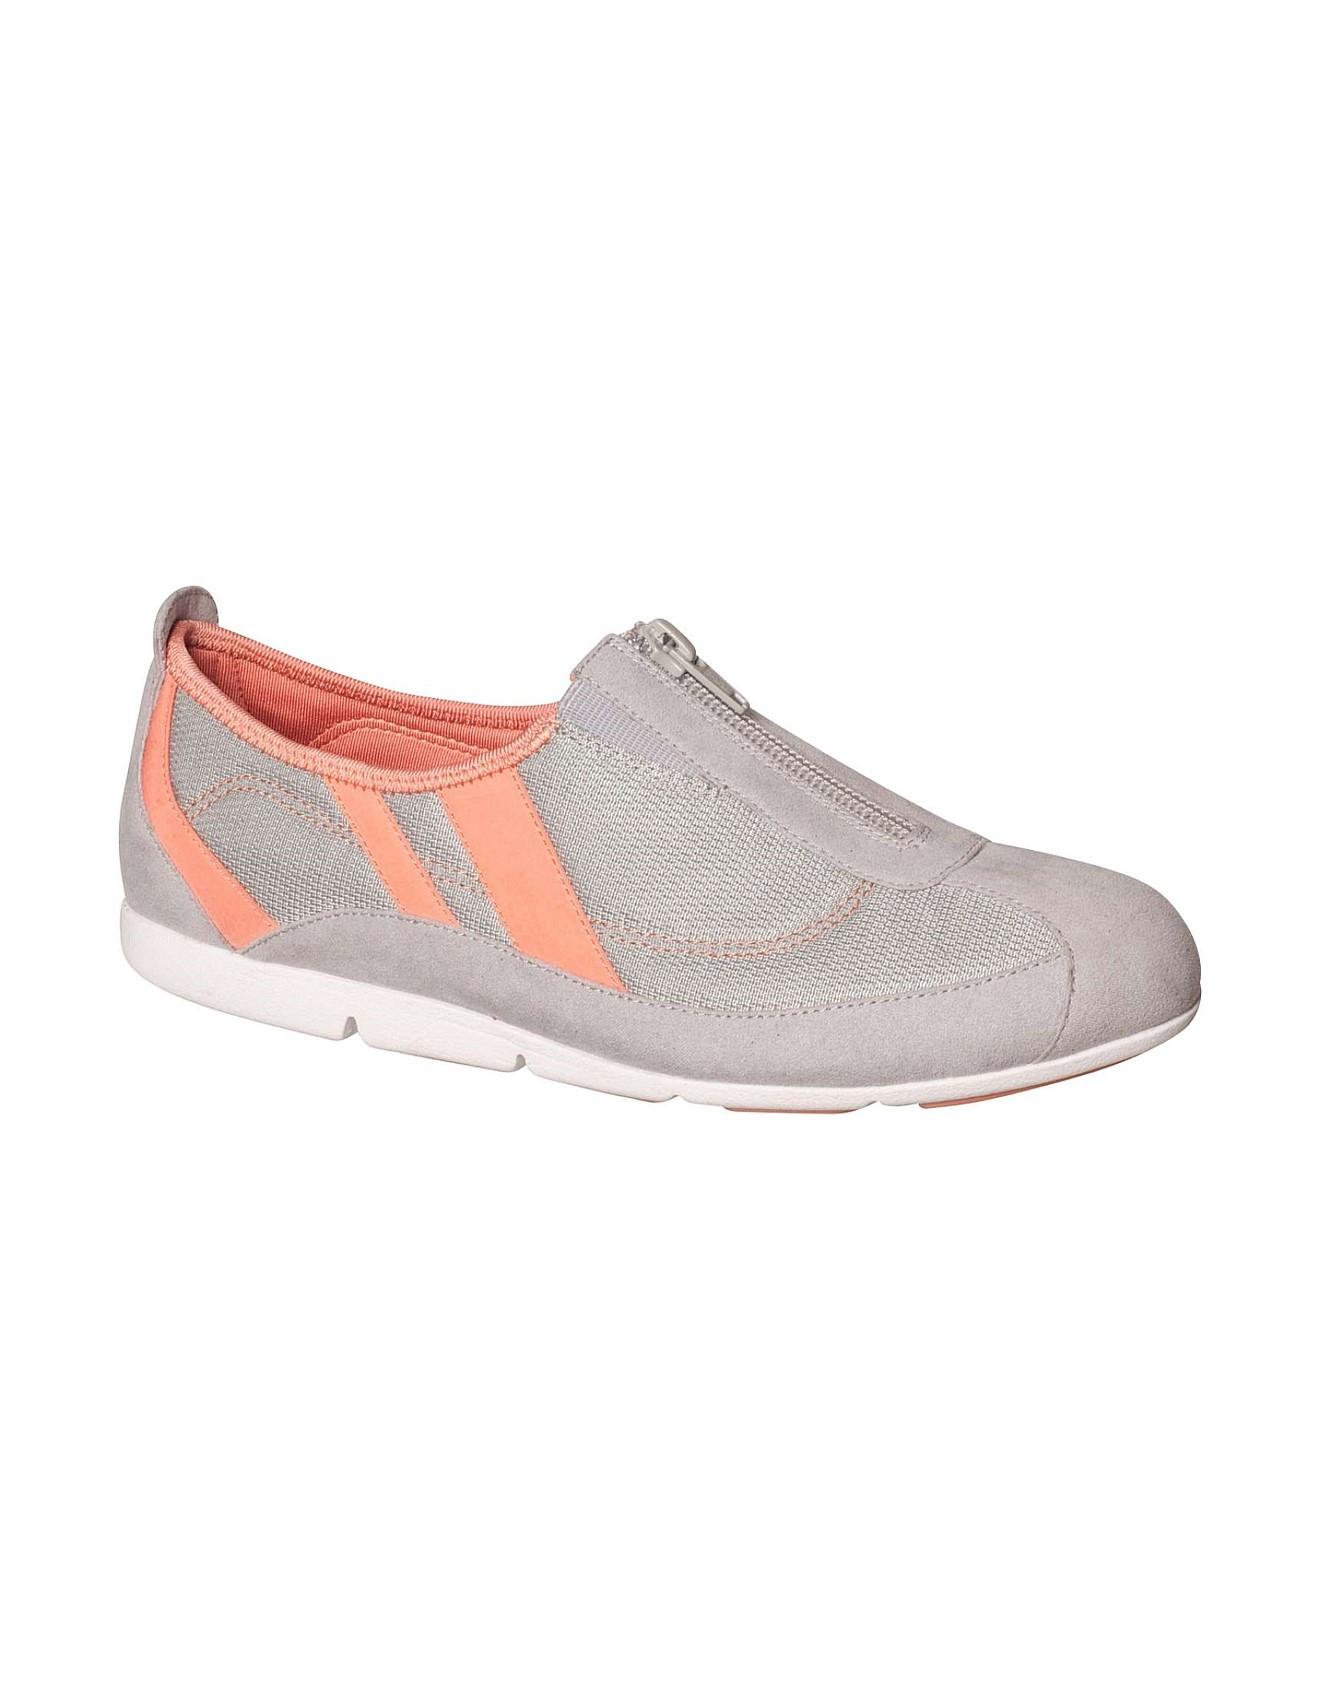 Women S Shoes Amp Sneakers Women S Sneakers Online David